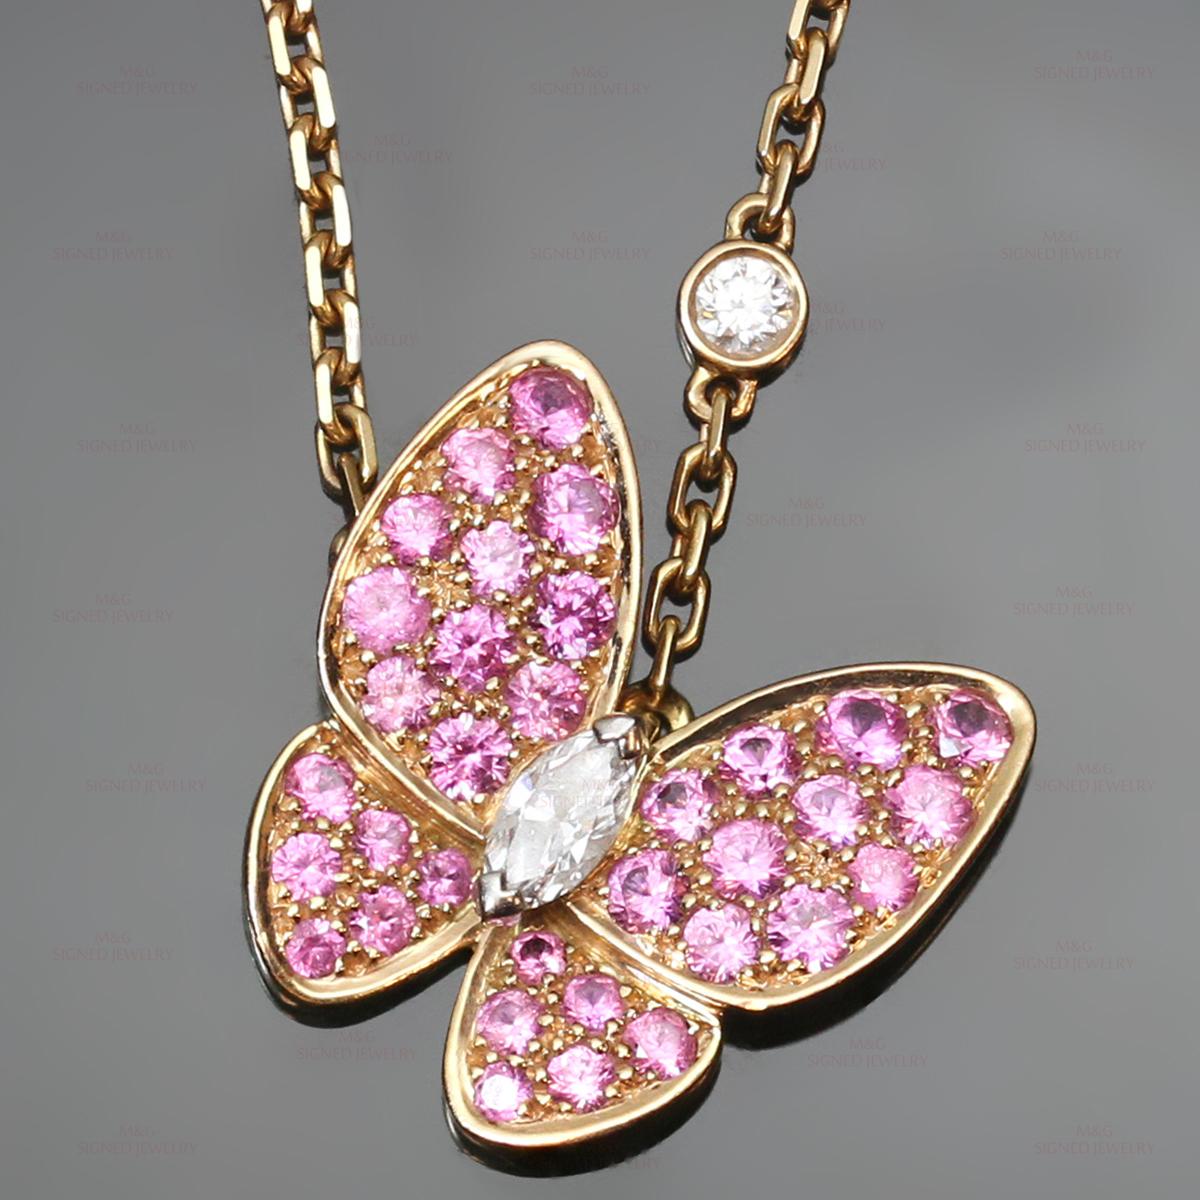 VAN CLEEF & ARPELS Diamond Pink Sapphire 18k Gold Butterfly Necklace